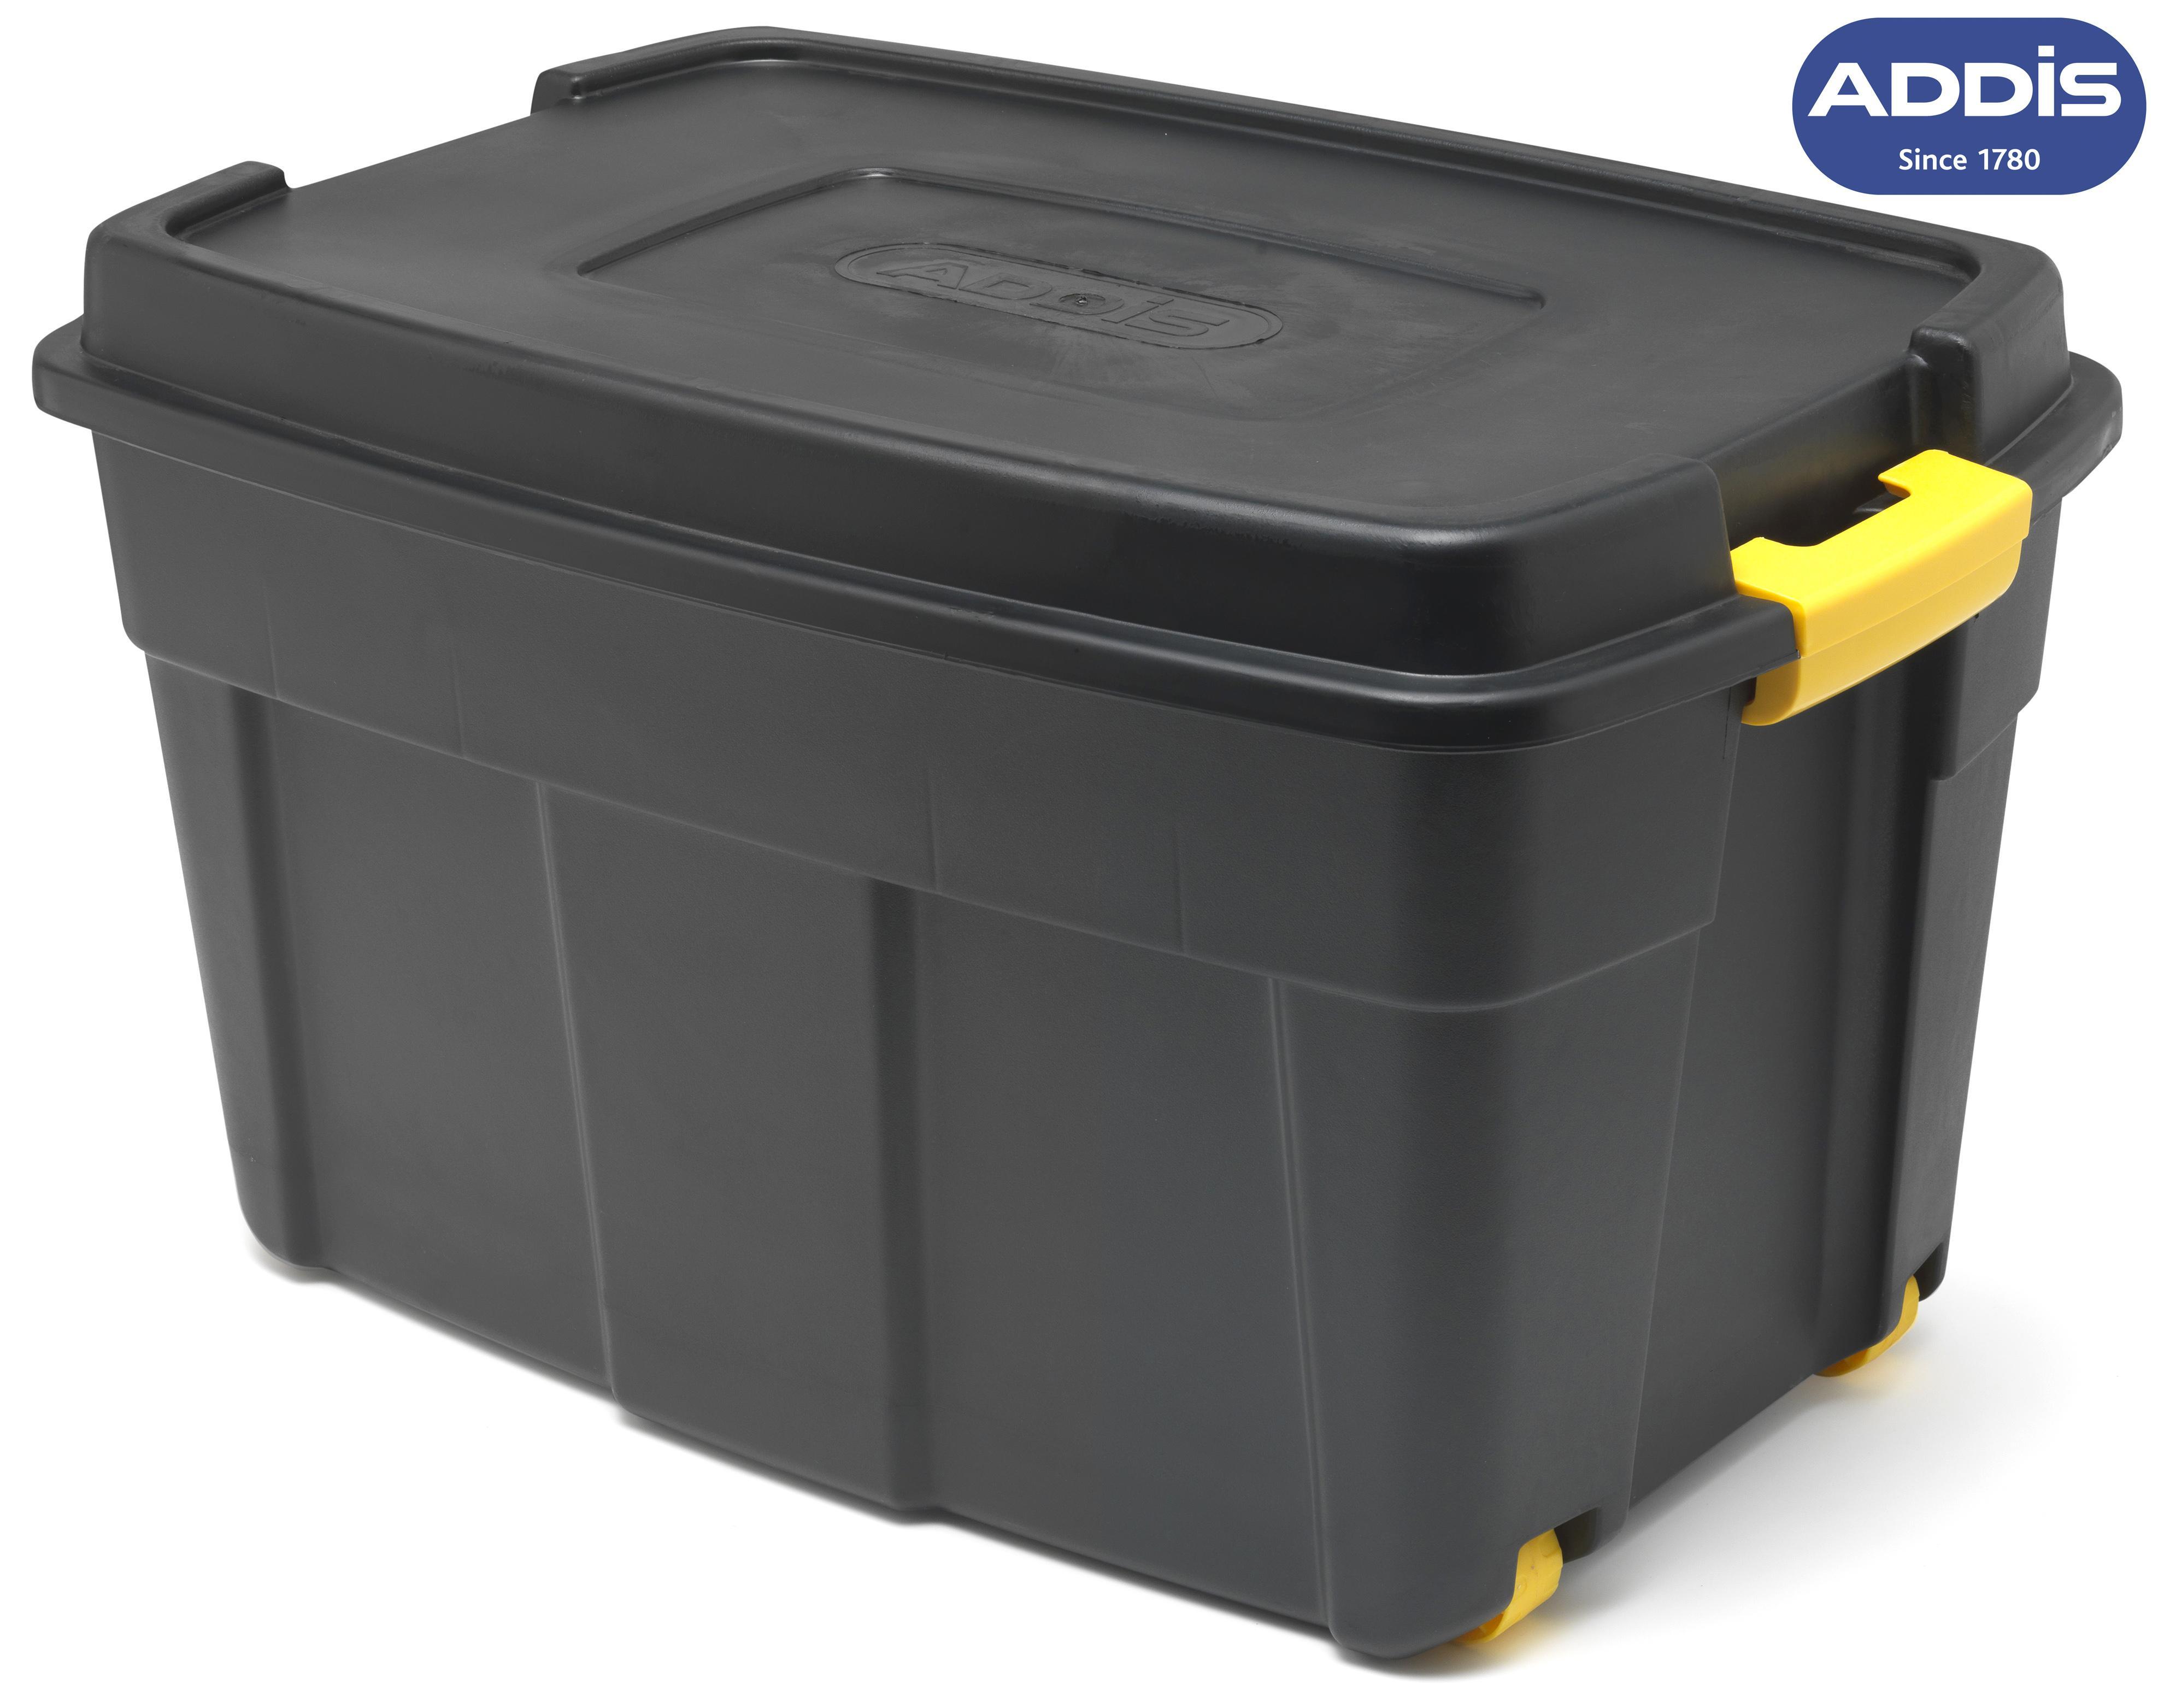 addis heavy duty mobile storage tote 110l black plastic lock lid handles wheels ebay. Black Bedroom Furniture Sets. Home Design Ideas